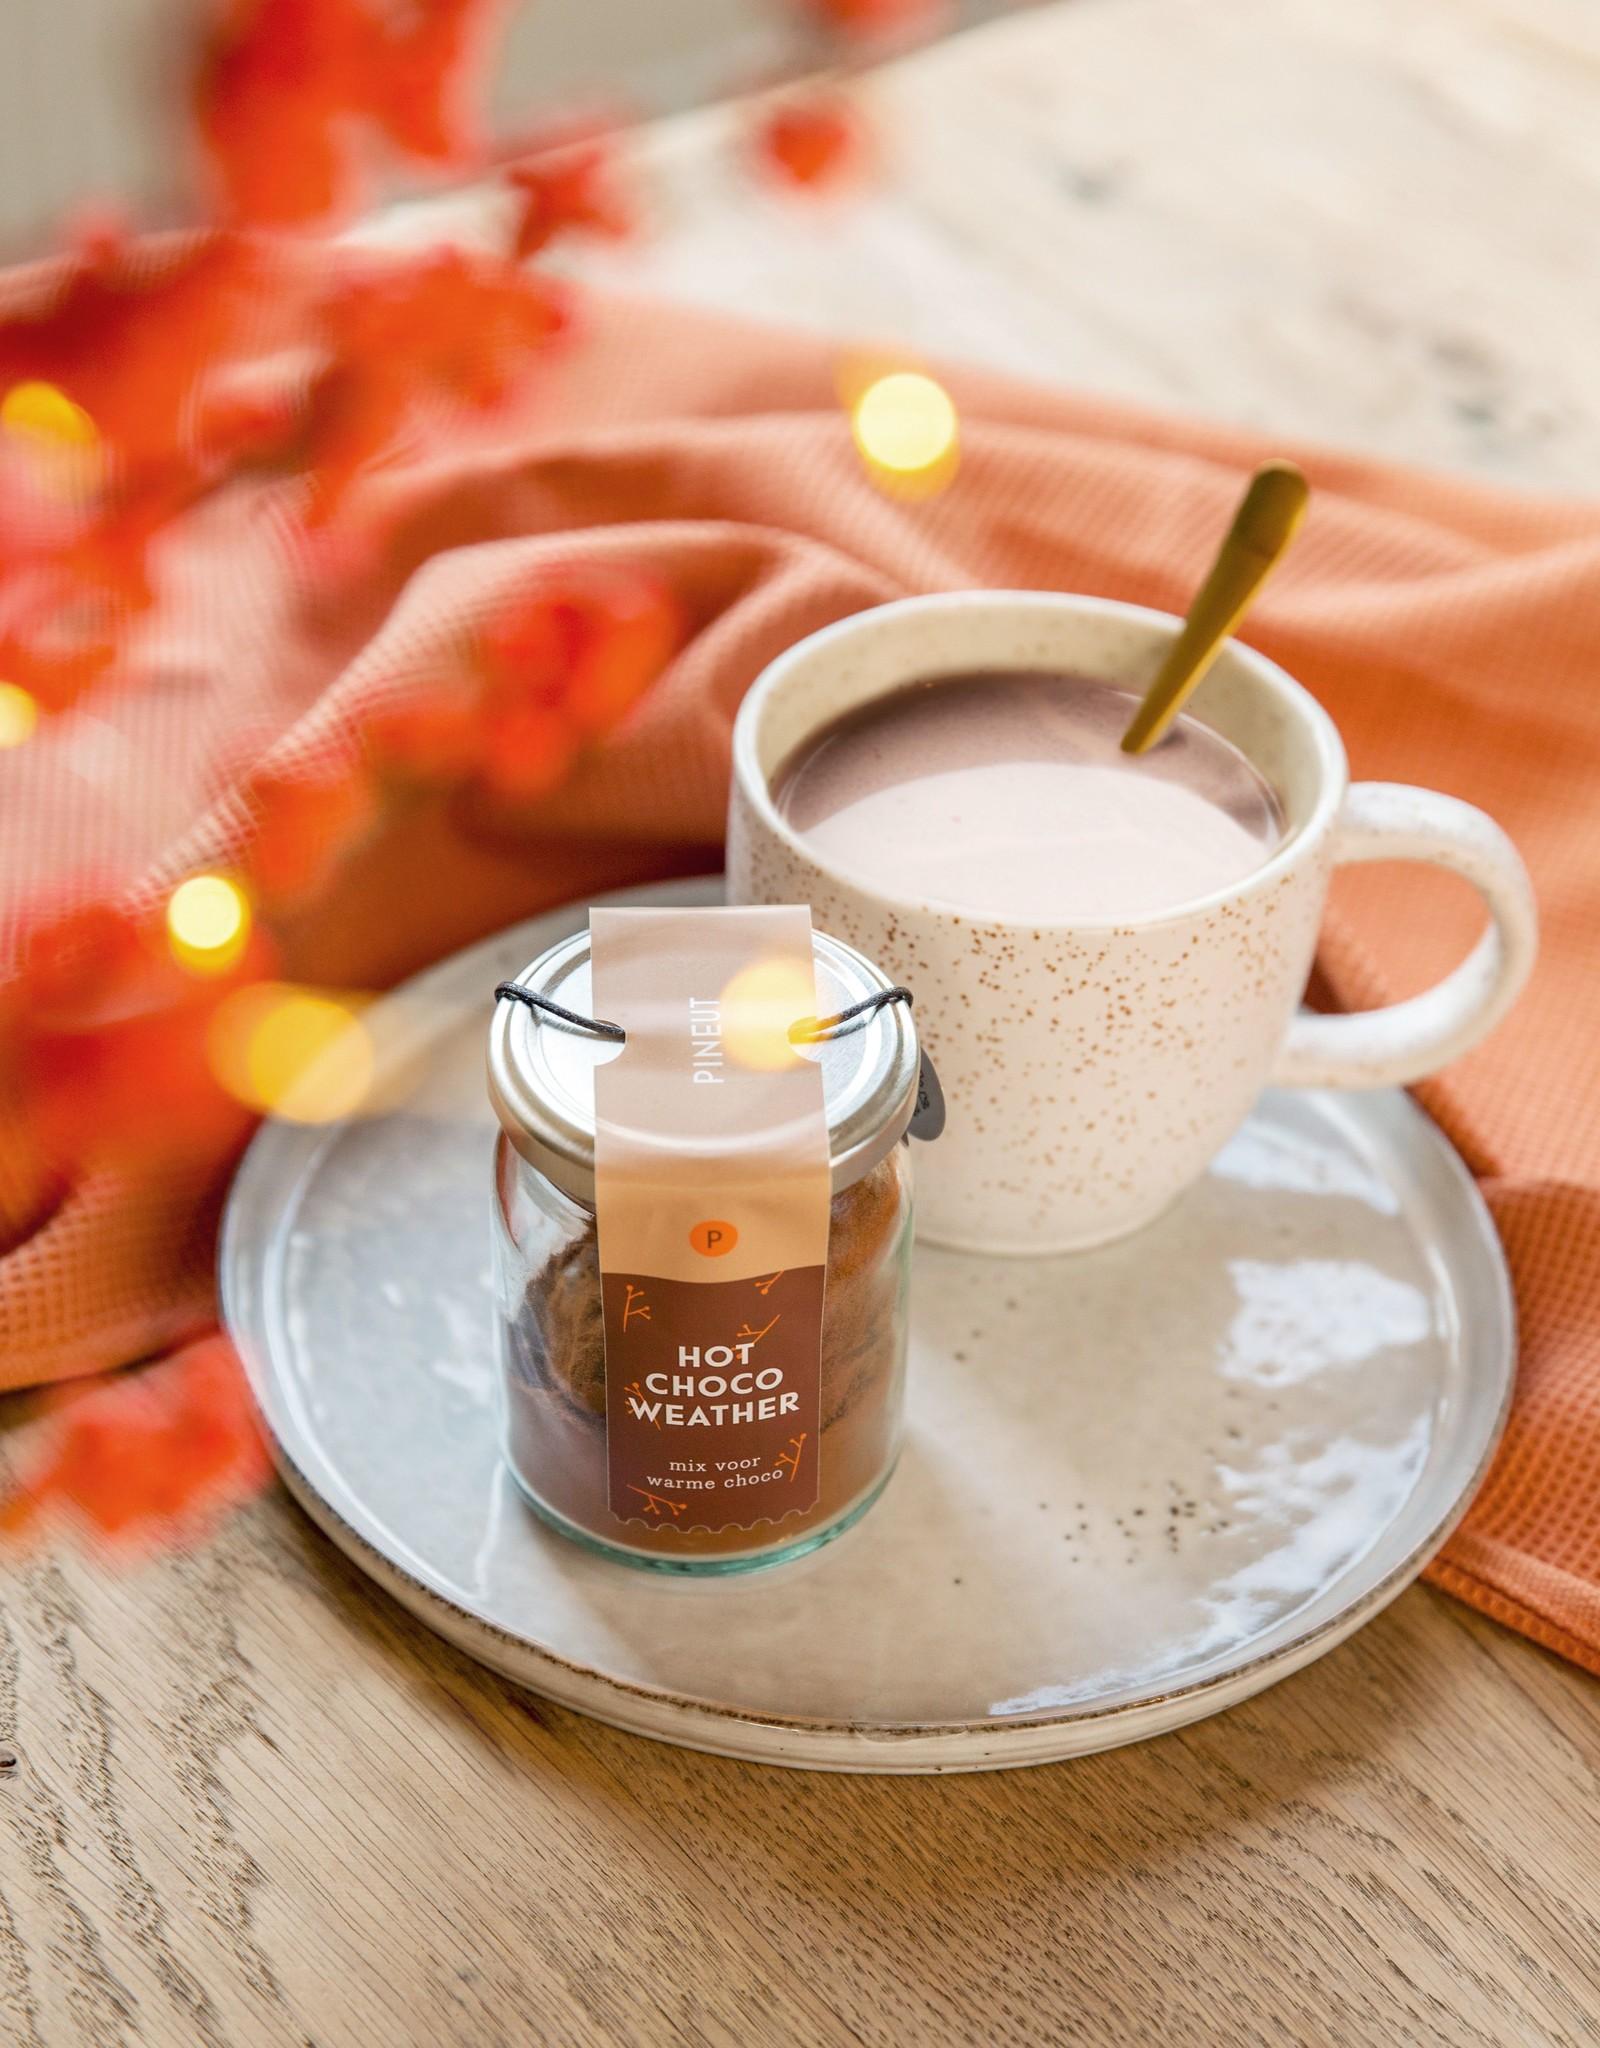 Pineut Likeur Winterdrank-Hot Chocolate